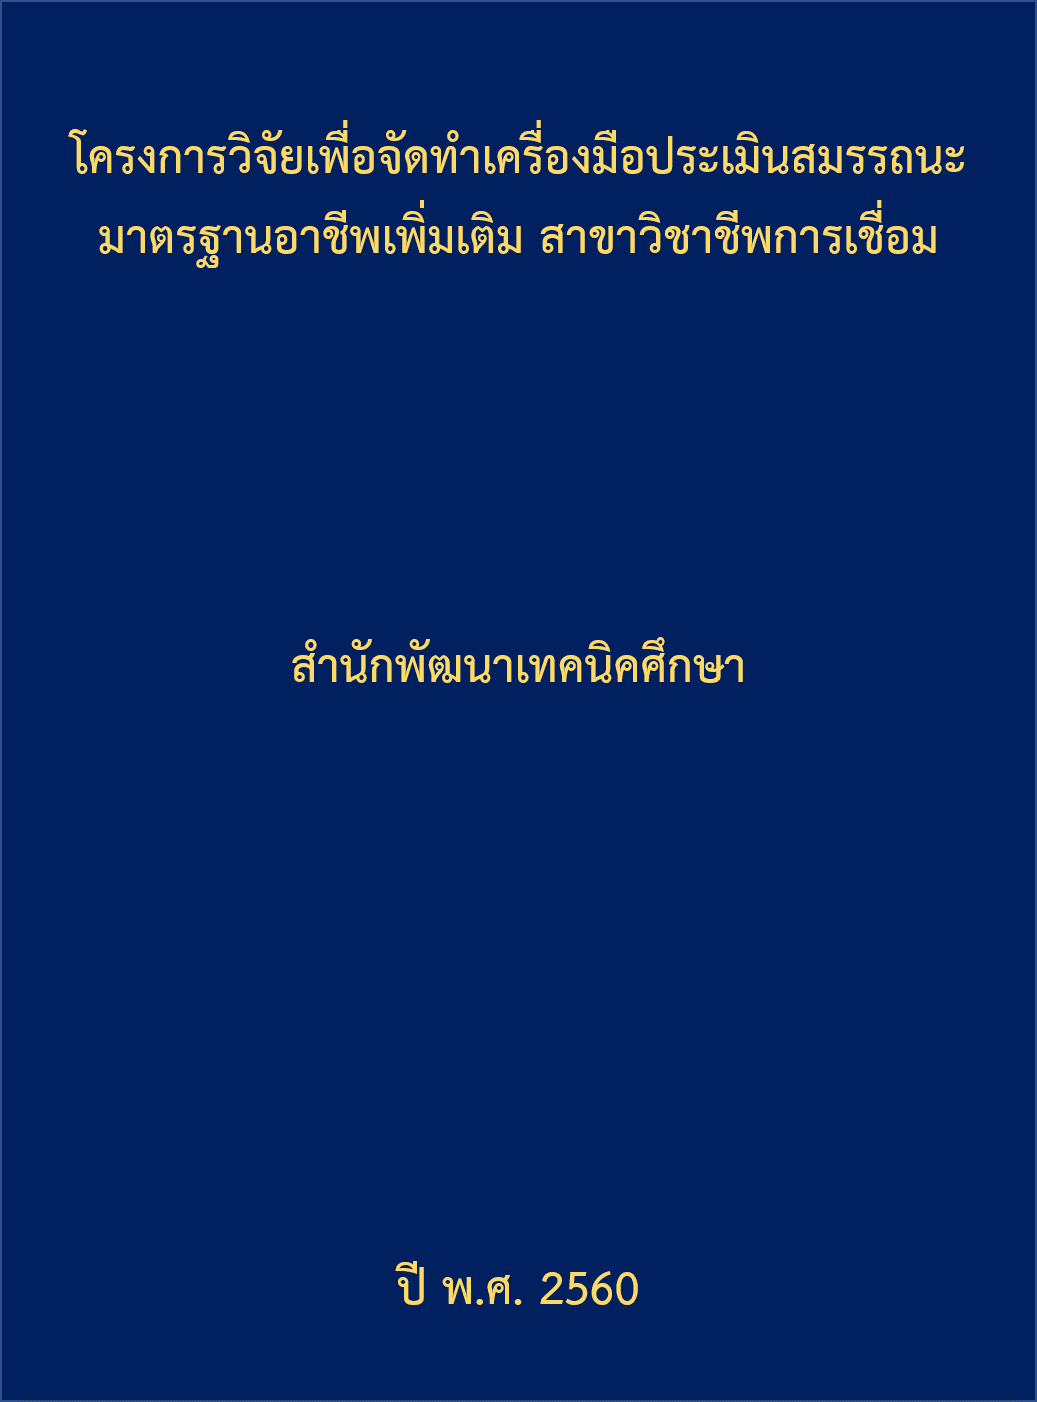 Cover of ปัจจัยที่มีอิทธิพลต่อแนวโน้มการตัดสินใจ ใช้หนังสืออิเล็กทรอนิกส์เพื่อการเรียนการสอน